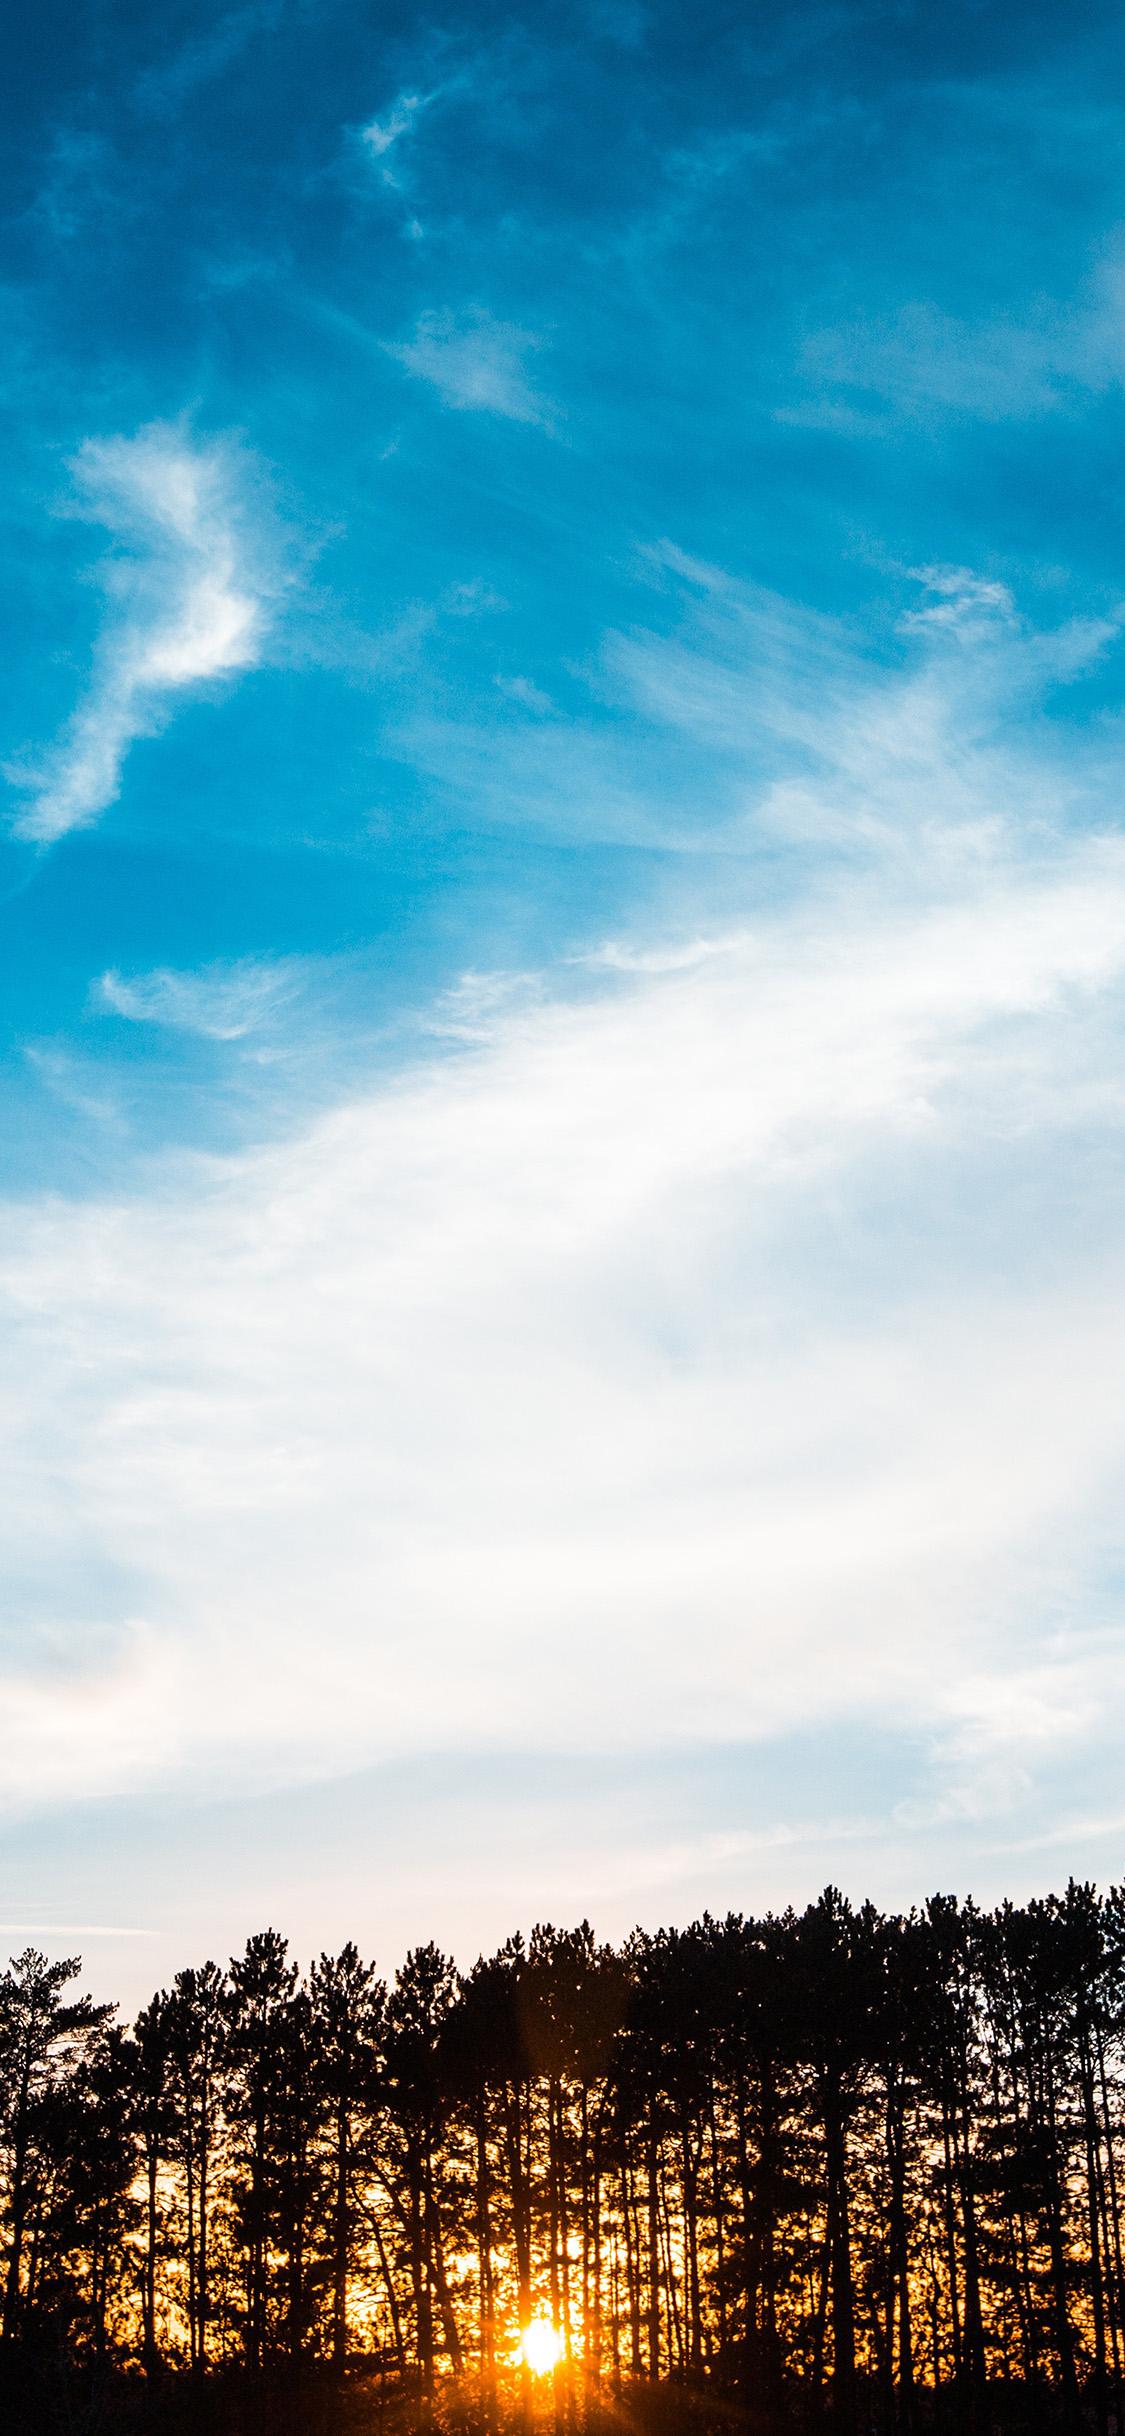 iPhonexpapers.com-Apple-iPhone-wallpaper-oa42-sky-wood-mountain-cloud-nature